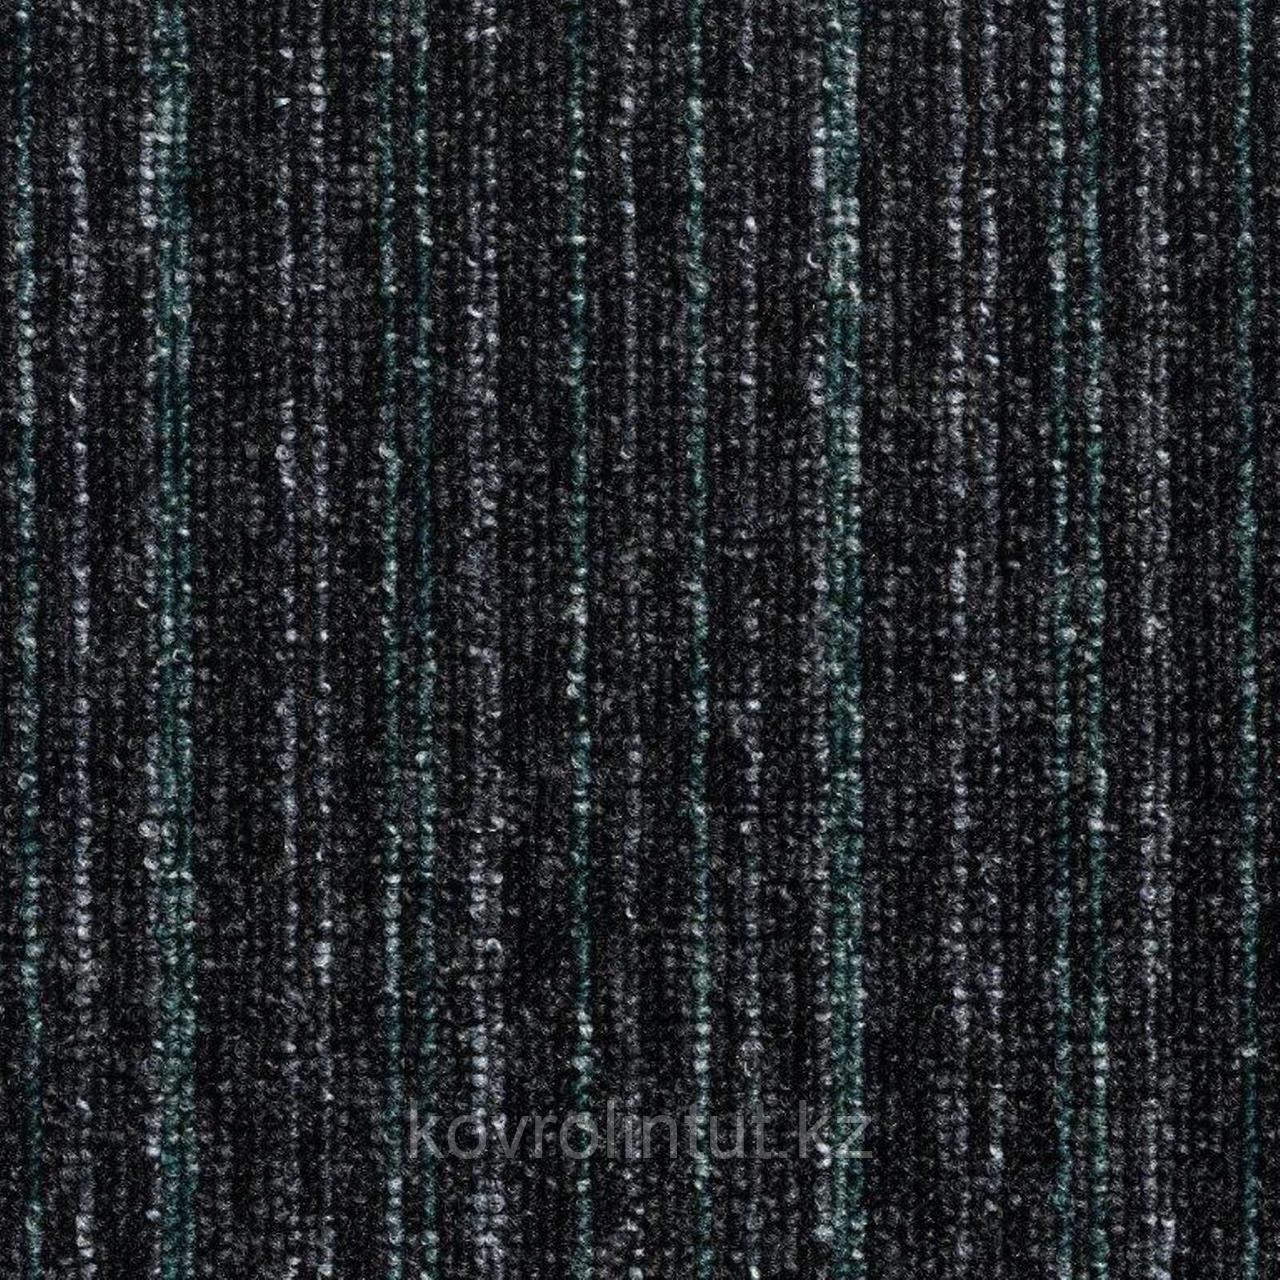 Плитка ковровая Сondor, Solid stripe 577, 50х50, 5м2/уп